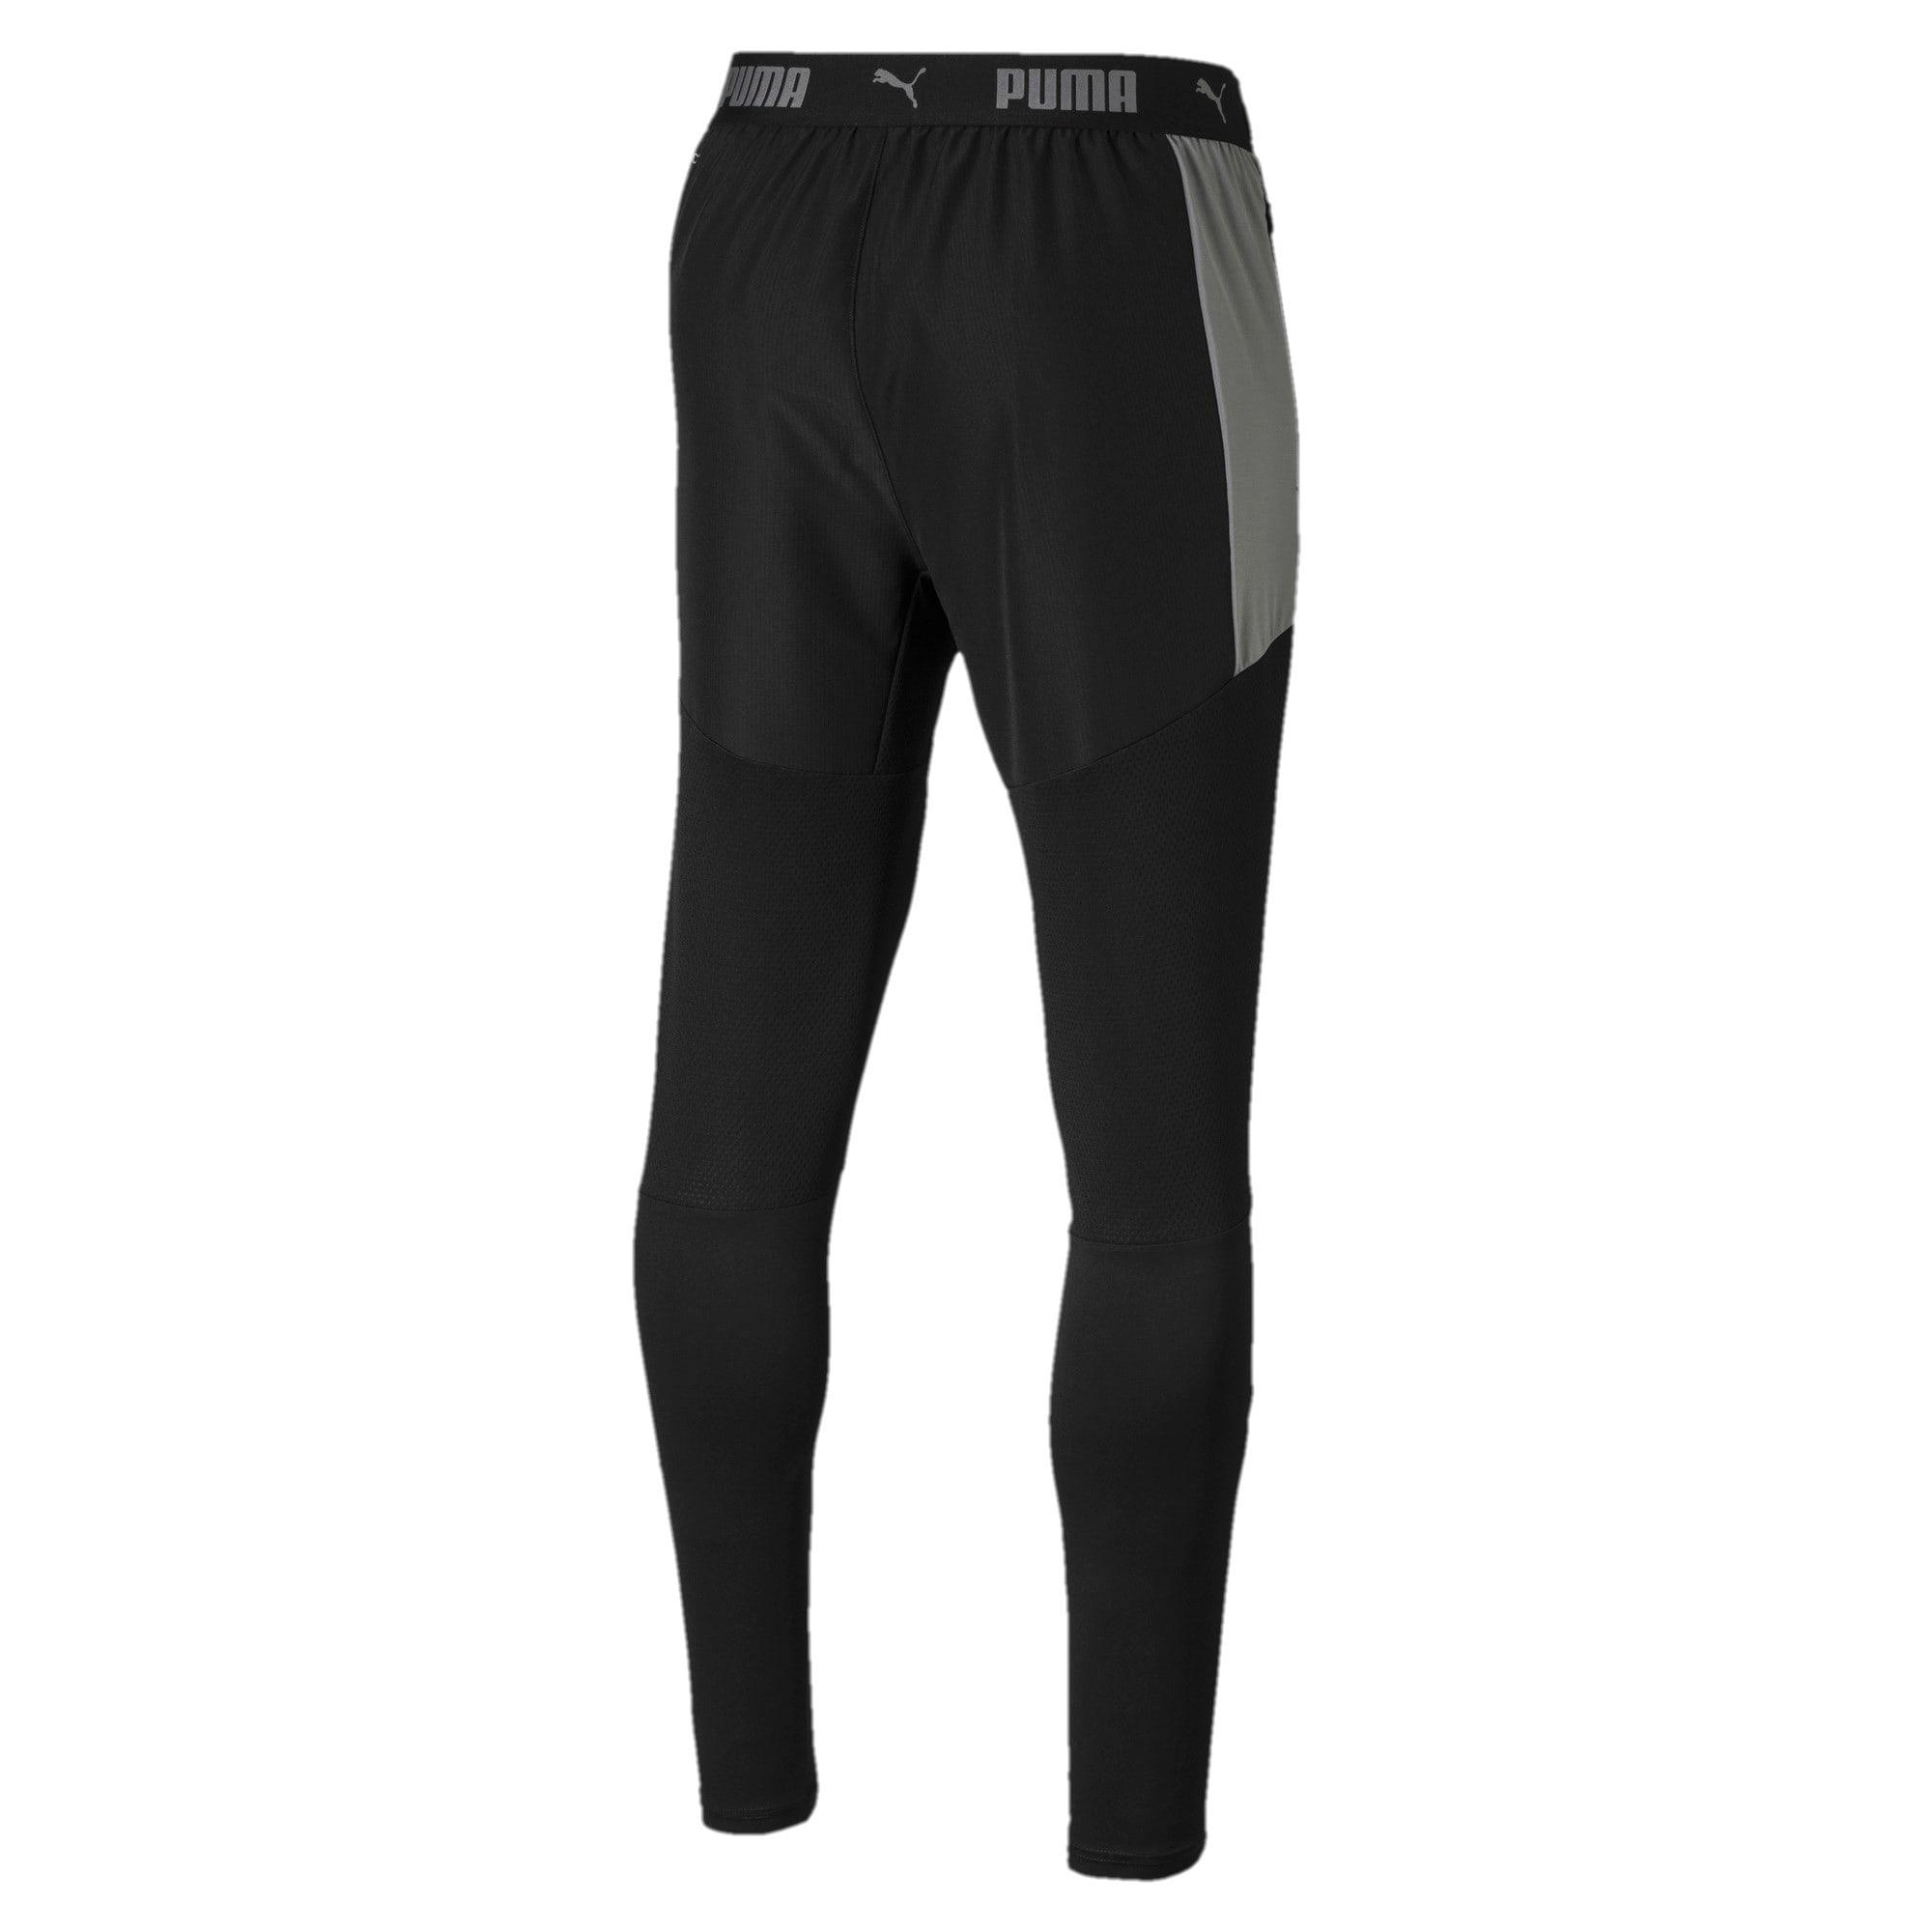 Thumbnail 5 of ftblNXT Men's Pro Pants, Puma Black-Nrgy Red, medium